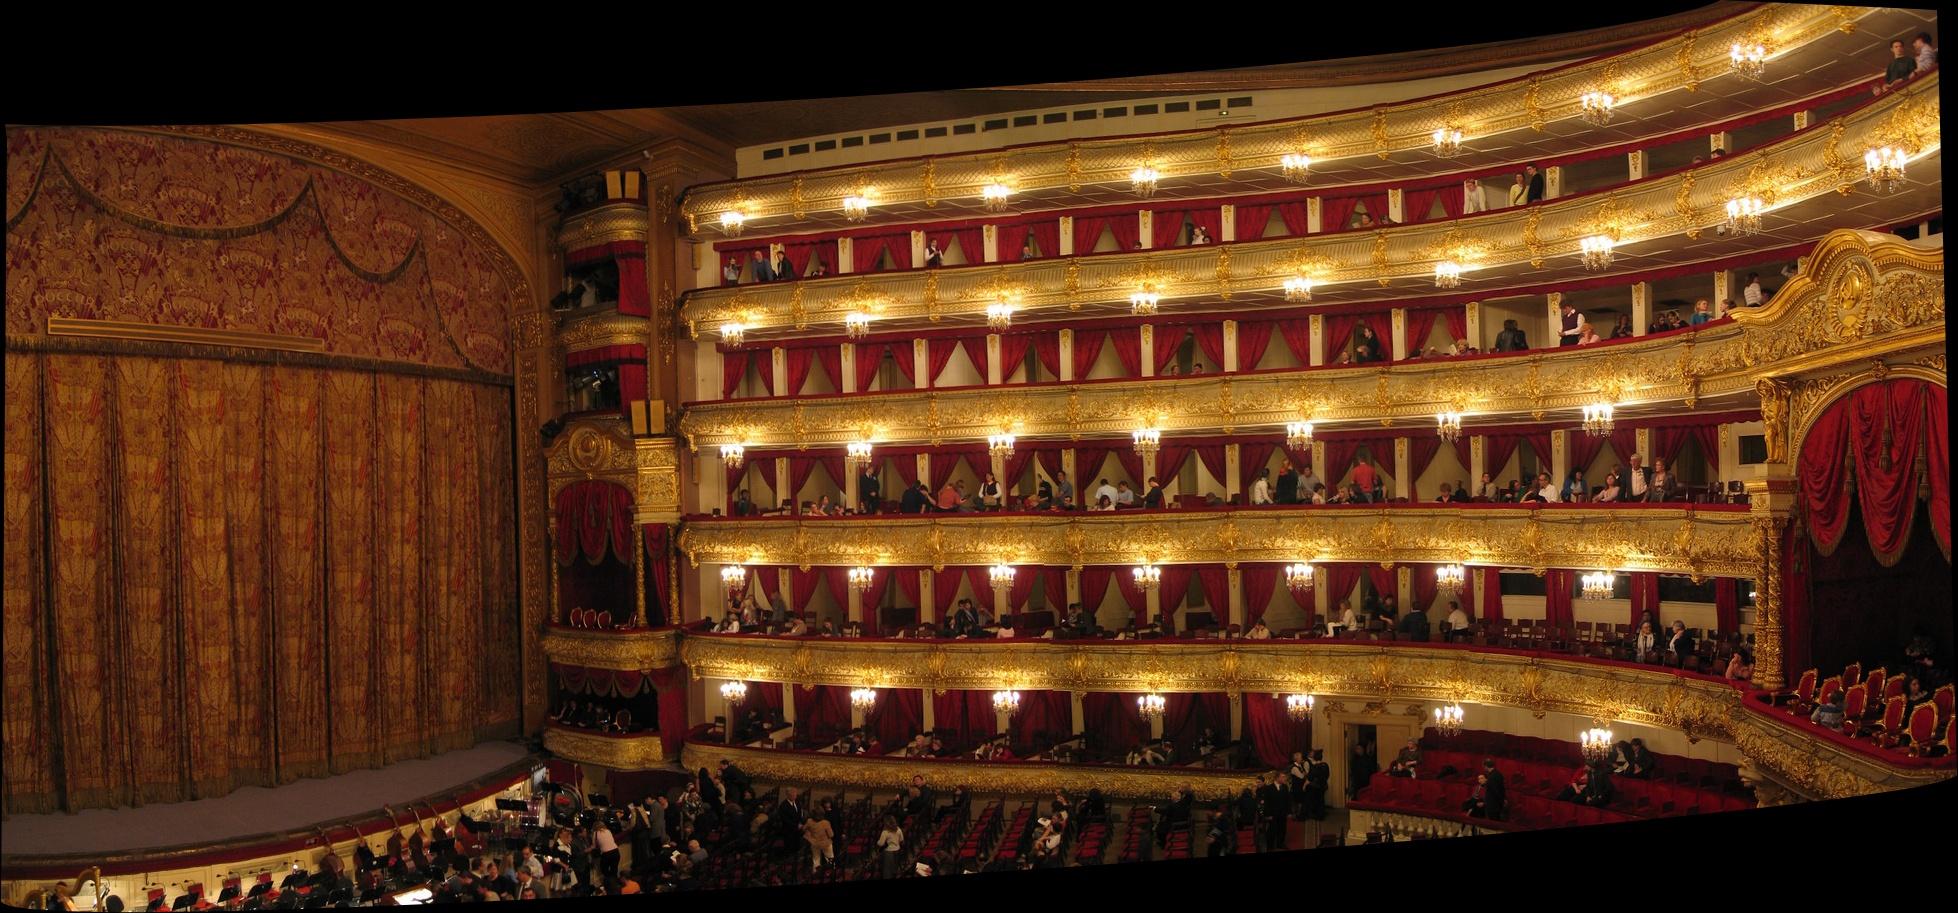 Inside_Moscow_Bolshoi_Theatre.jpg